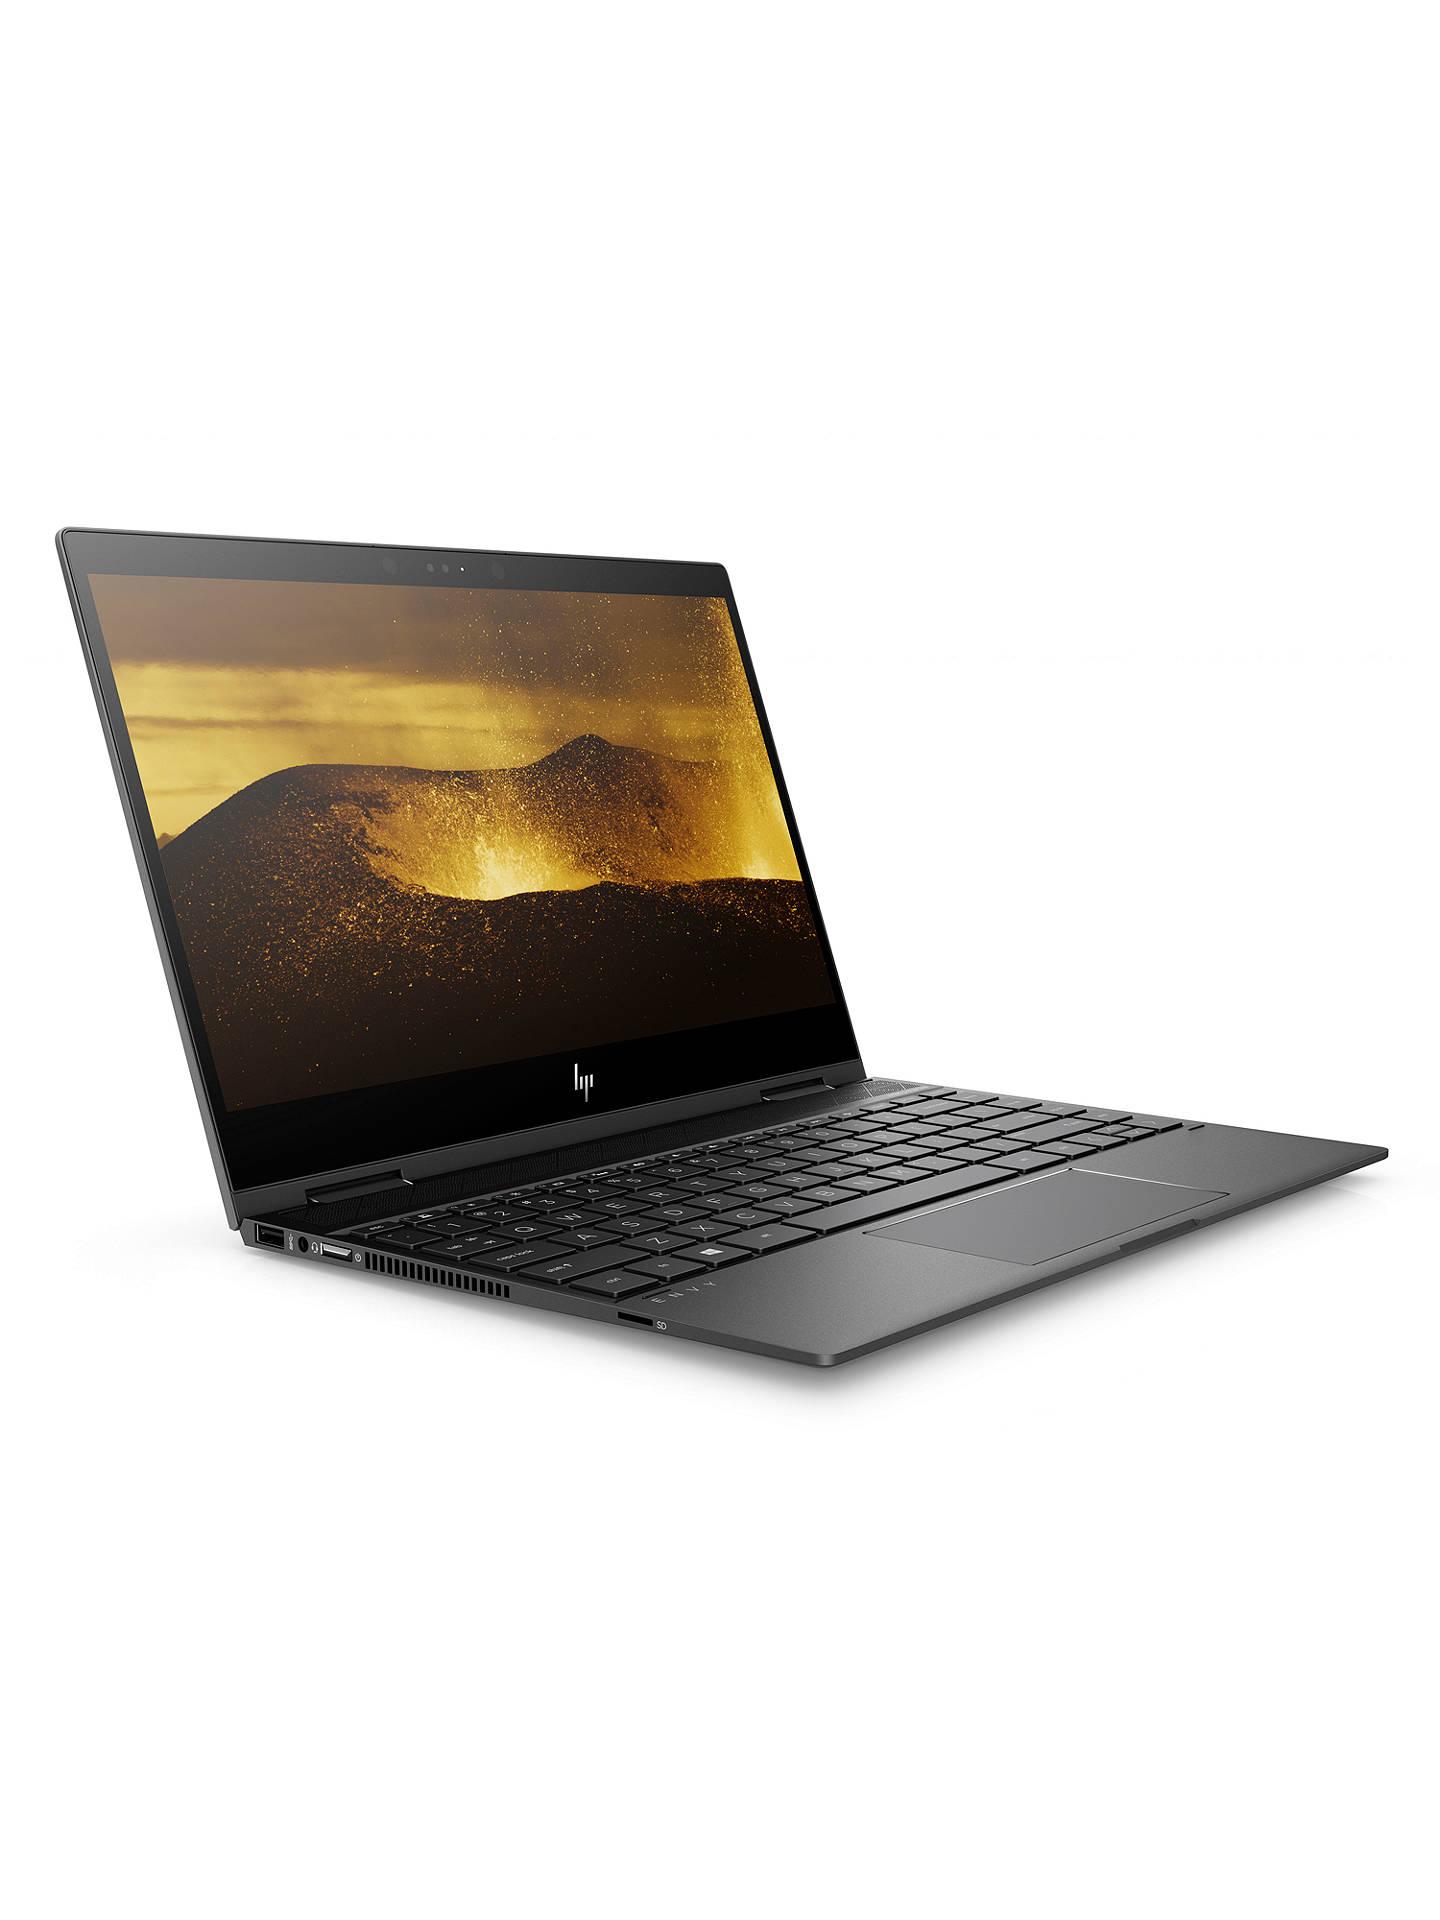 "HP ENVY x360 13-ag0999na Convertible Laptop, AMD Ryzen 5, 8GB RAM, 256GB  NVMe SSD, 13 3"" Full HD Touchscreen, Dark Ash"